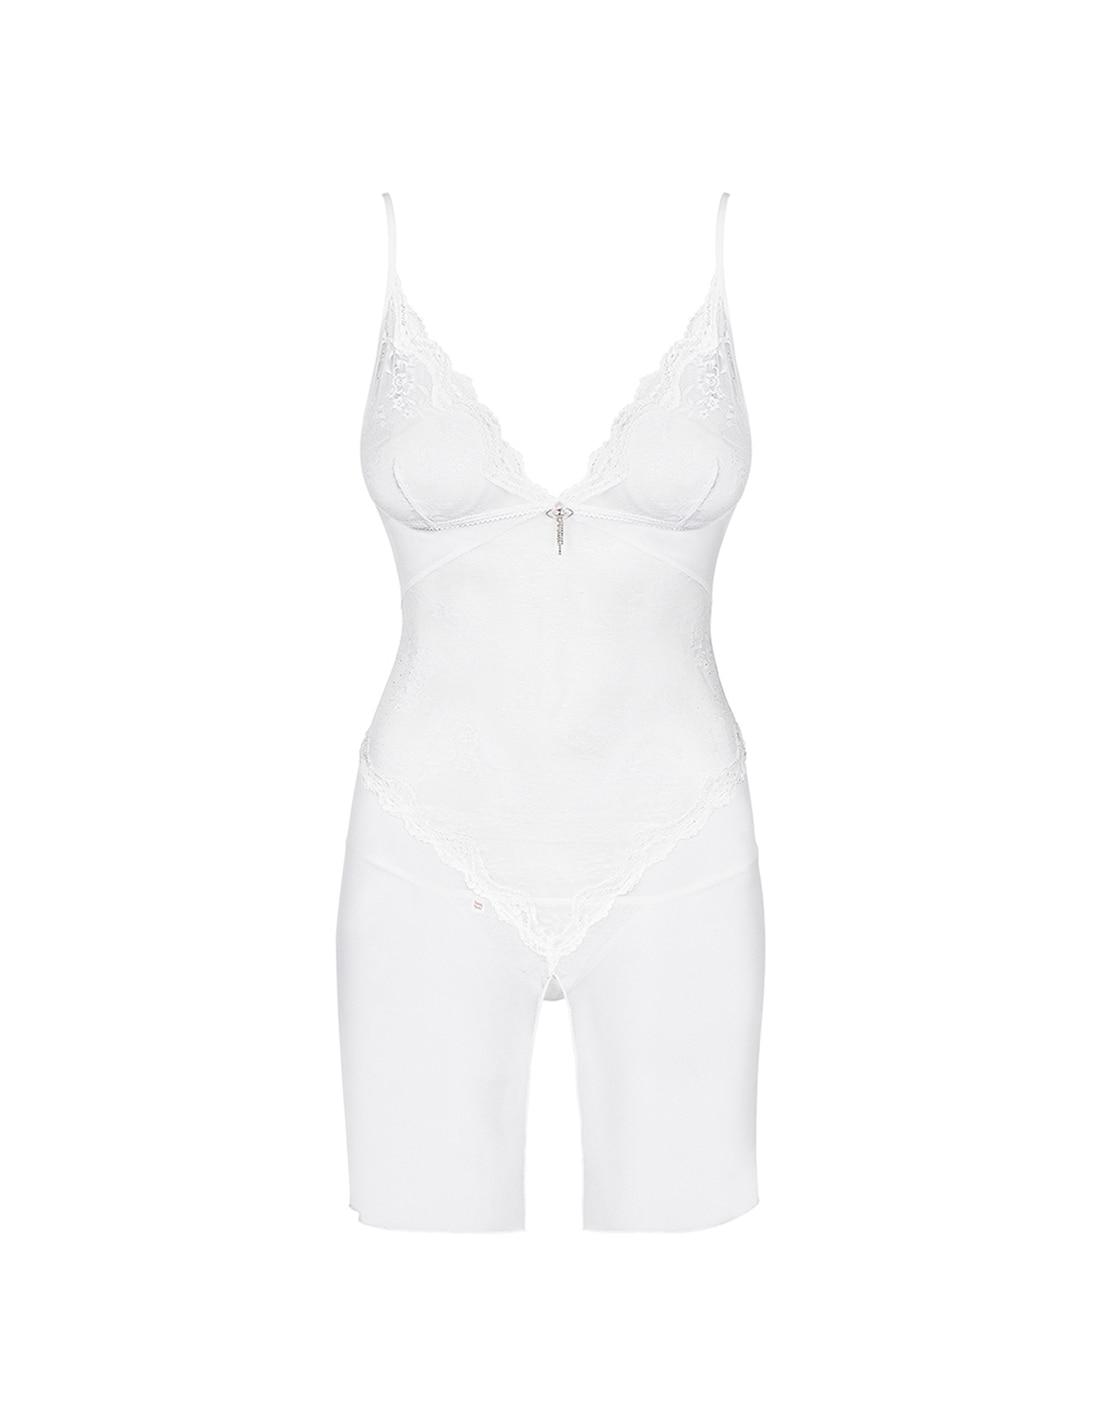 Camisa de Noite Charms Obsessive Branca - 36-38 S/M - PR2010340094